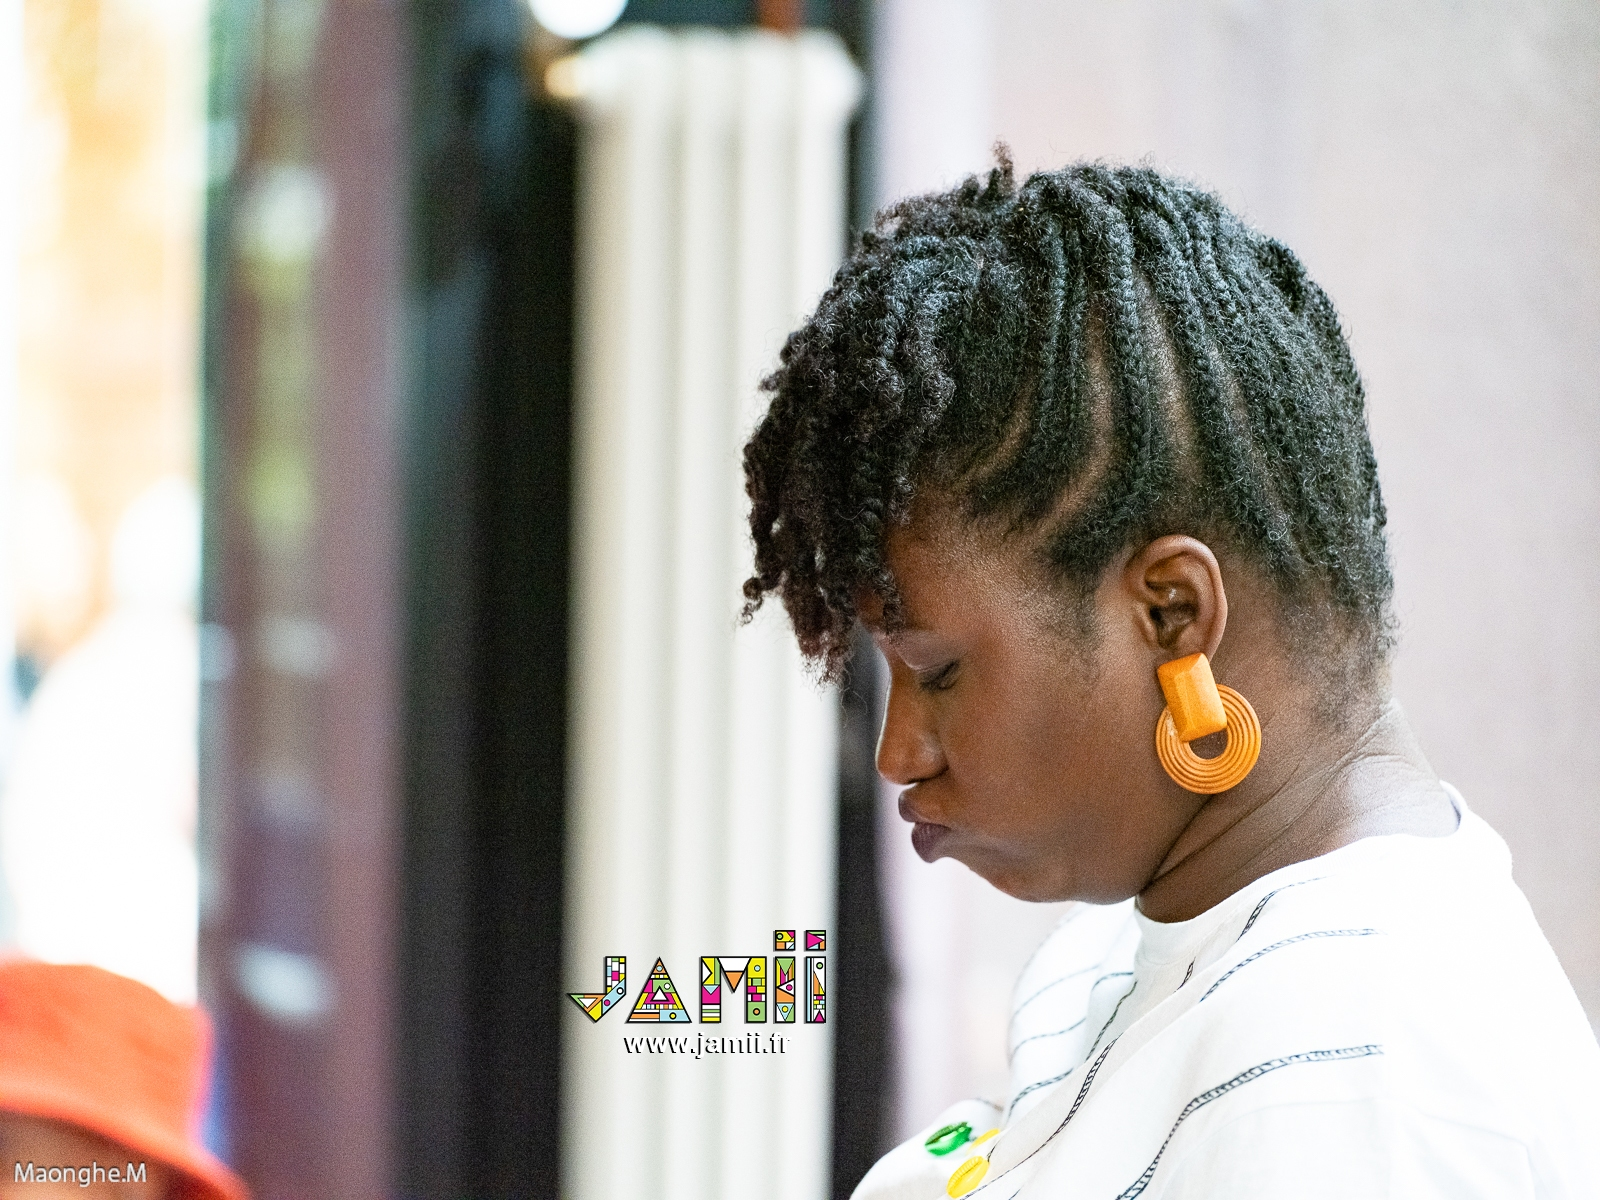 jamii-party-2308-42